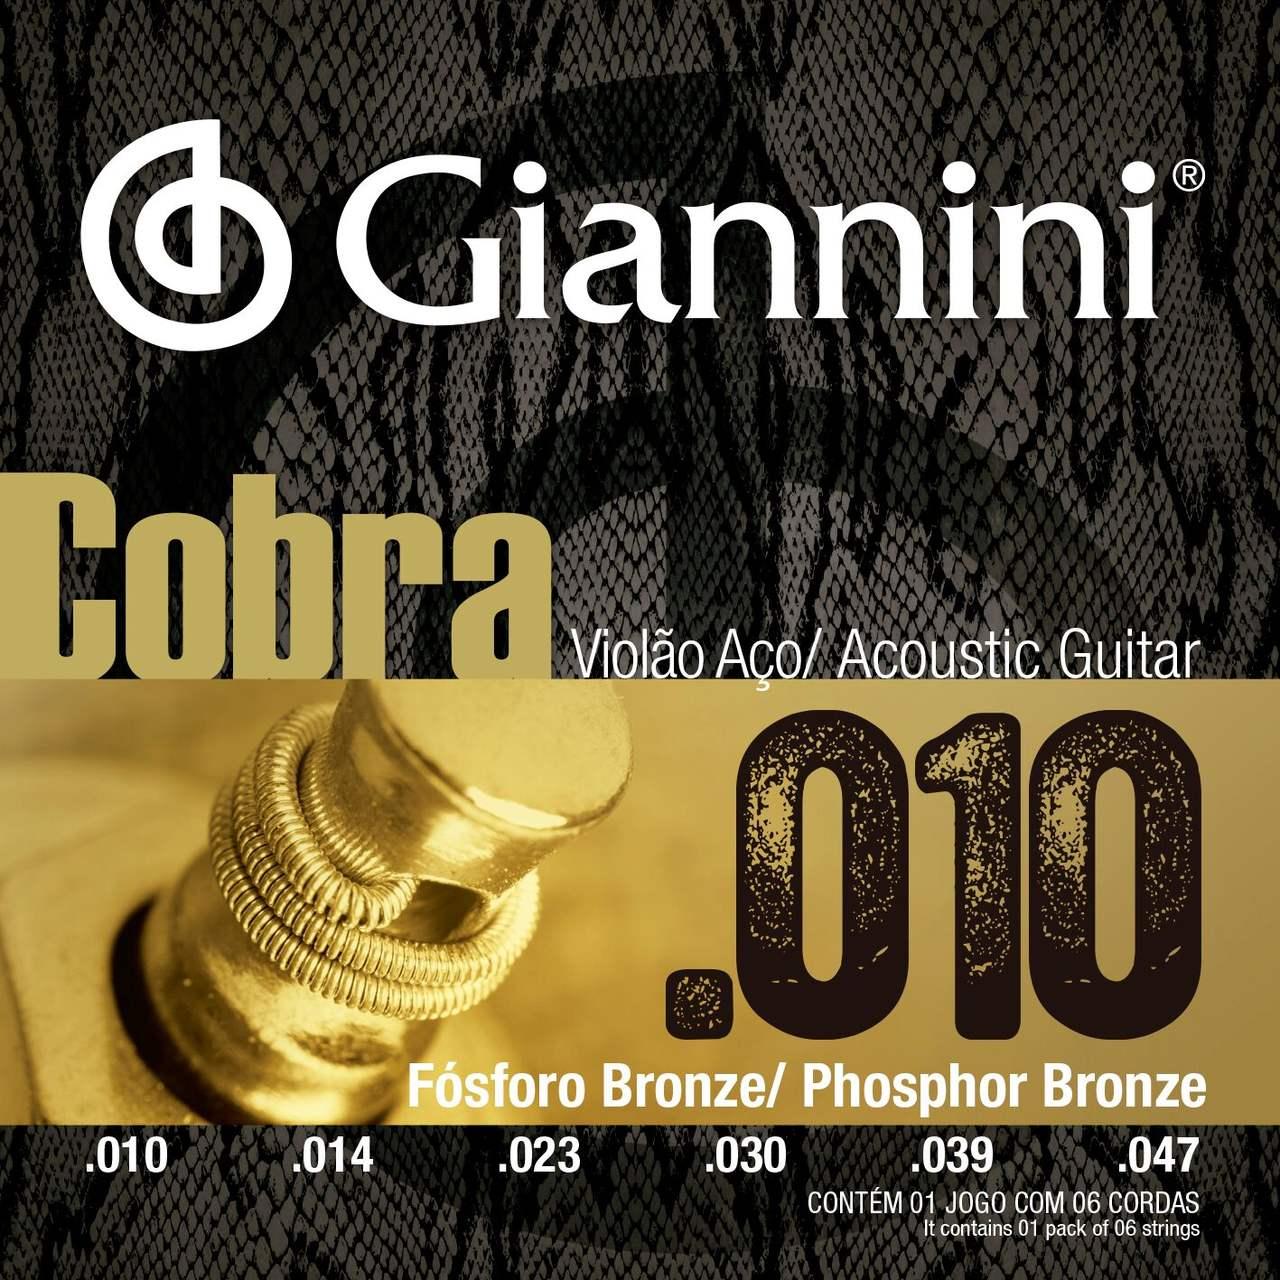 "Encordoamento p/Violão Aço Giannini Fósforo Bronze .010"" - GEEFLEF"